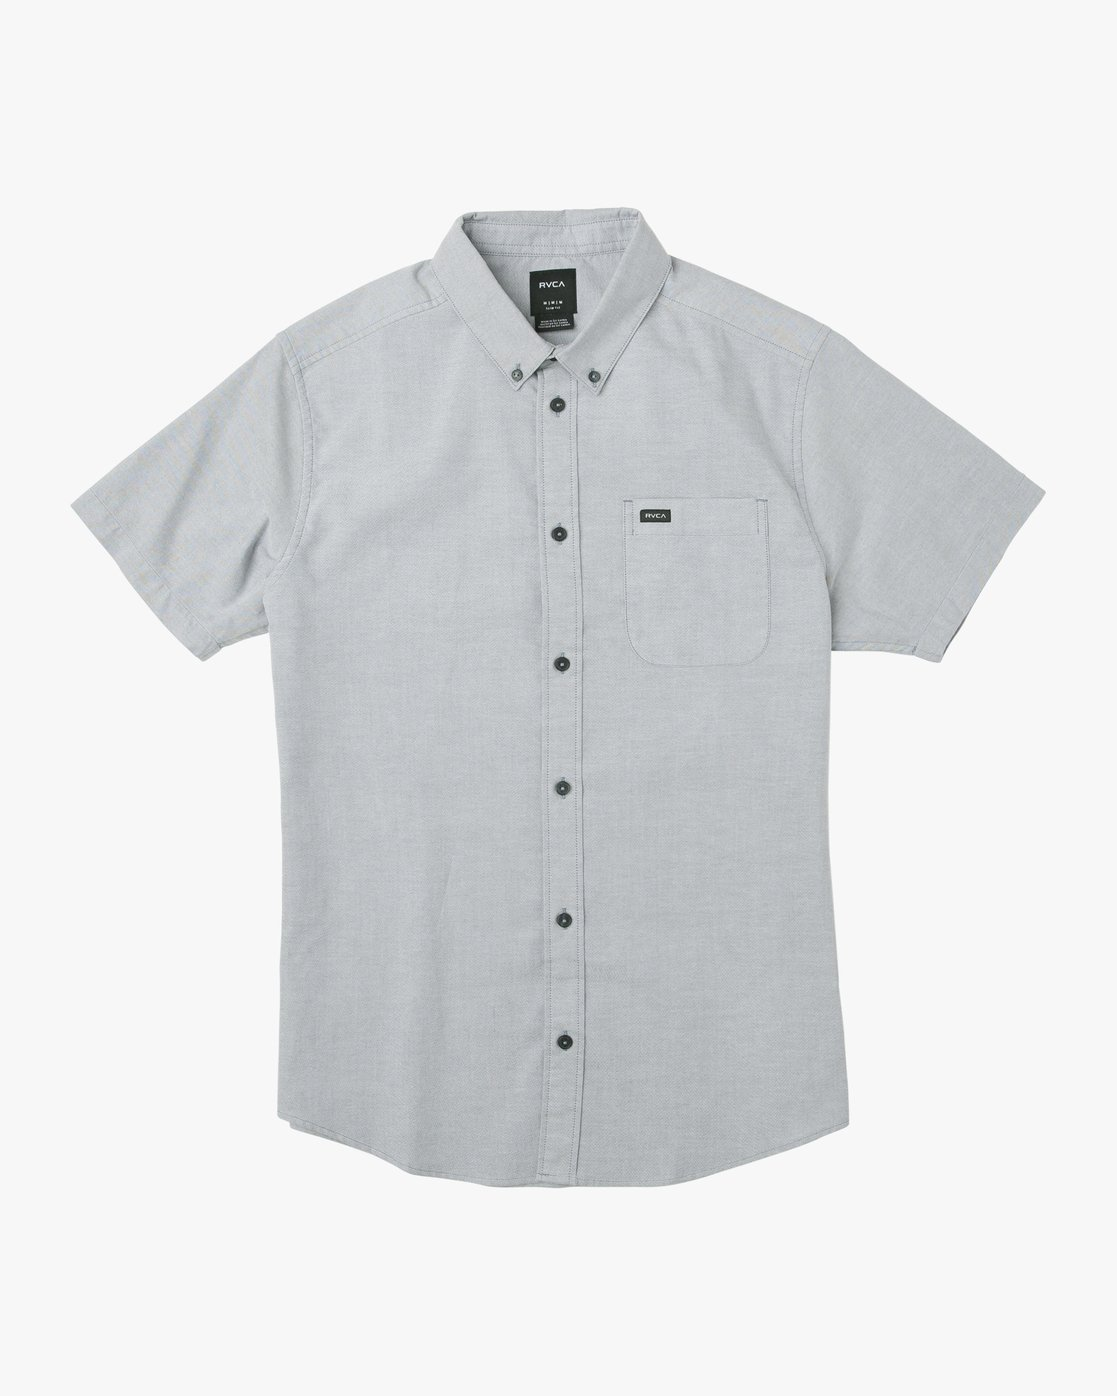 0 That'll Do Stretch Short Sleeve Shirt Multicolor MK515TDS RVCA